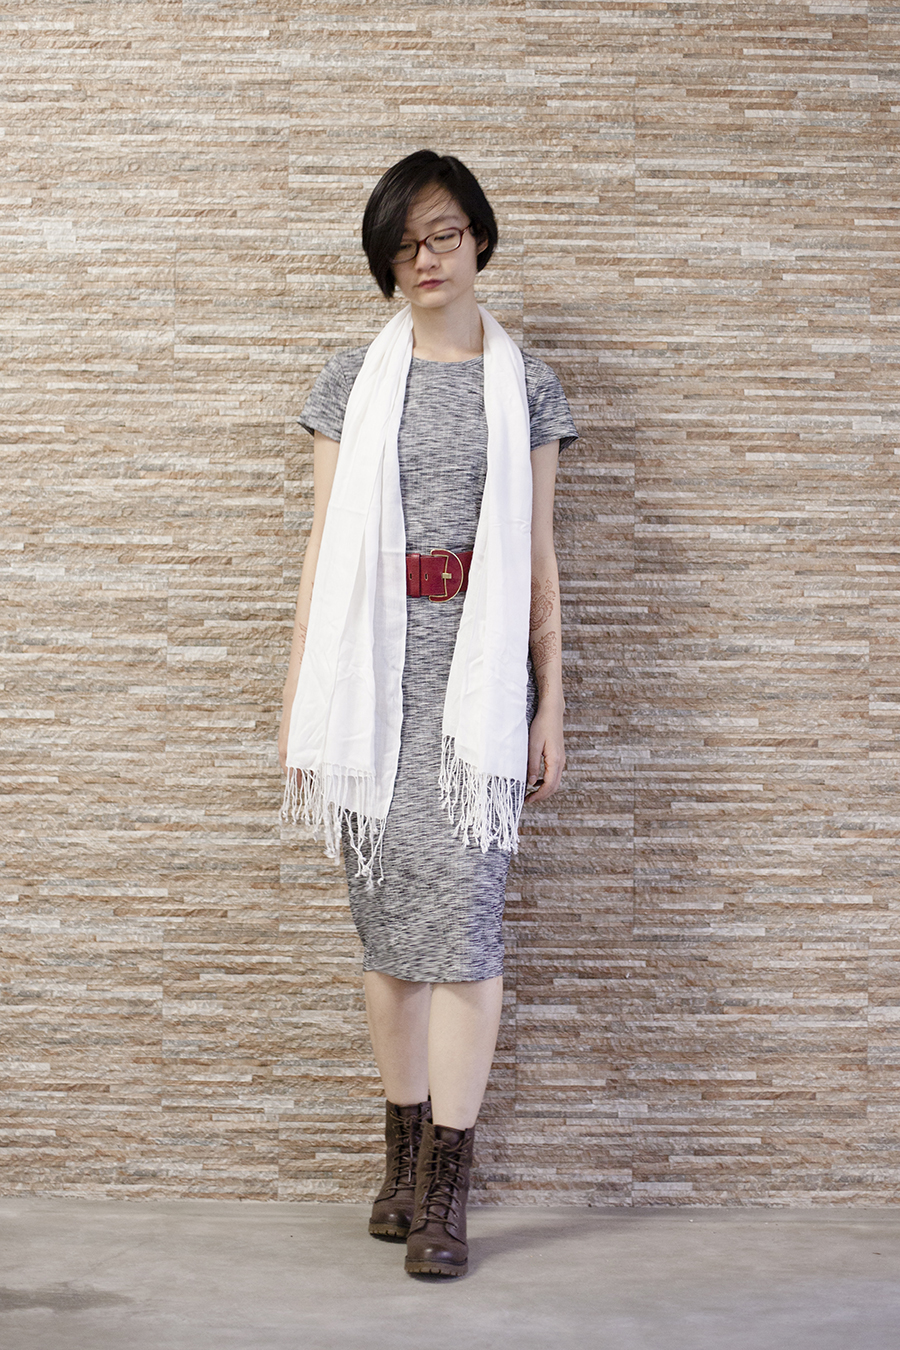 Cotton On heather grey bodycon midi dress, Steve Madden boots, Accessorize red belt, Firmoo glasses, white pashmina shawl.